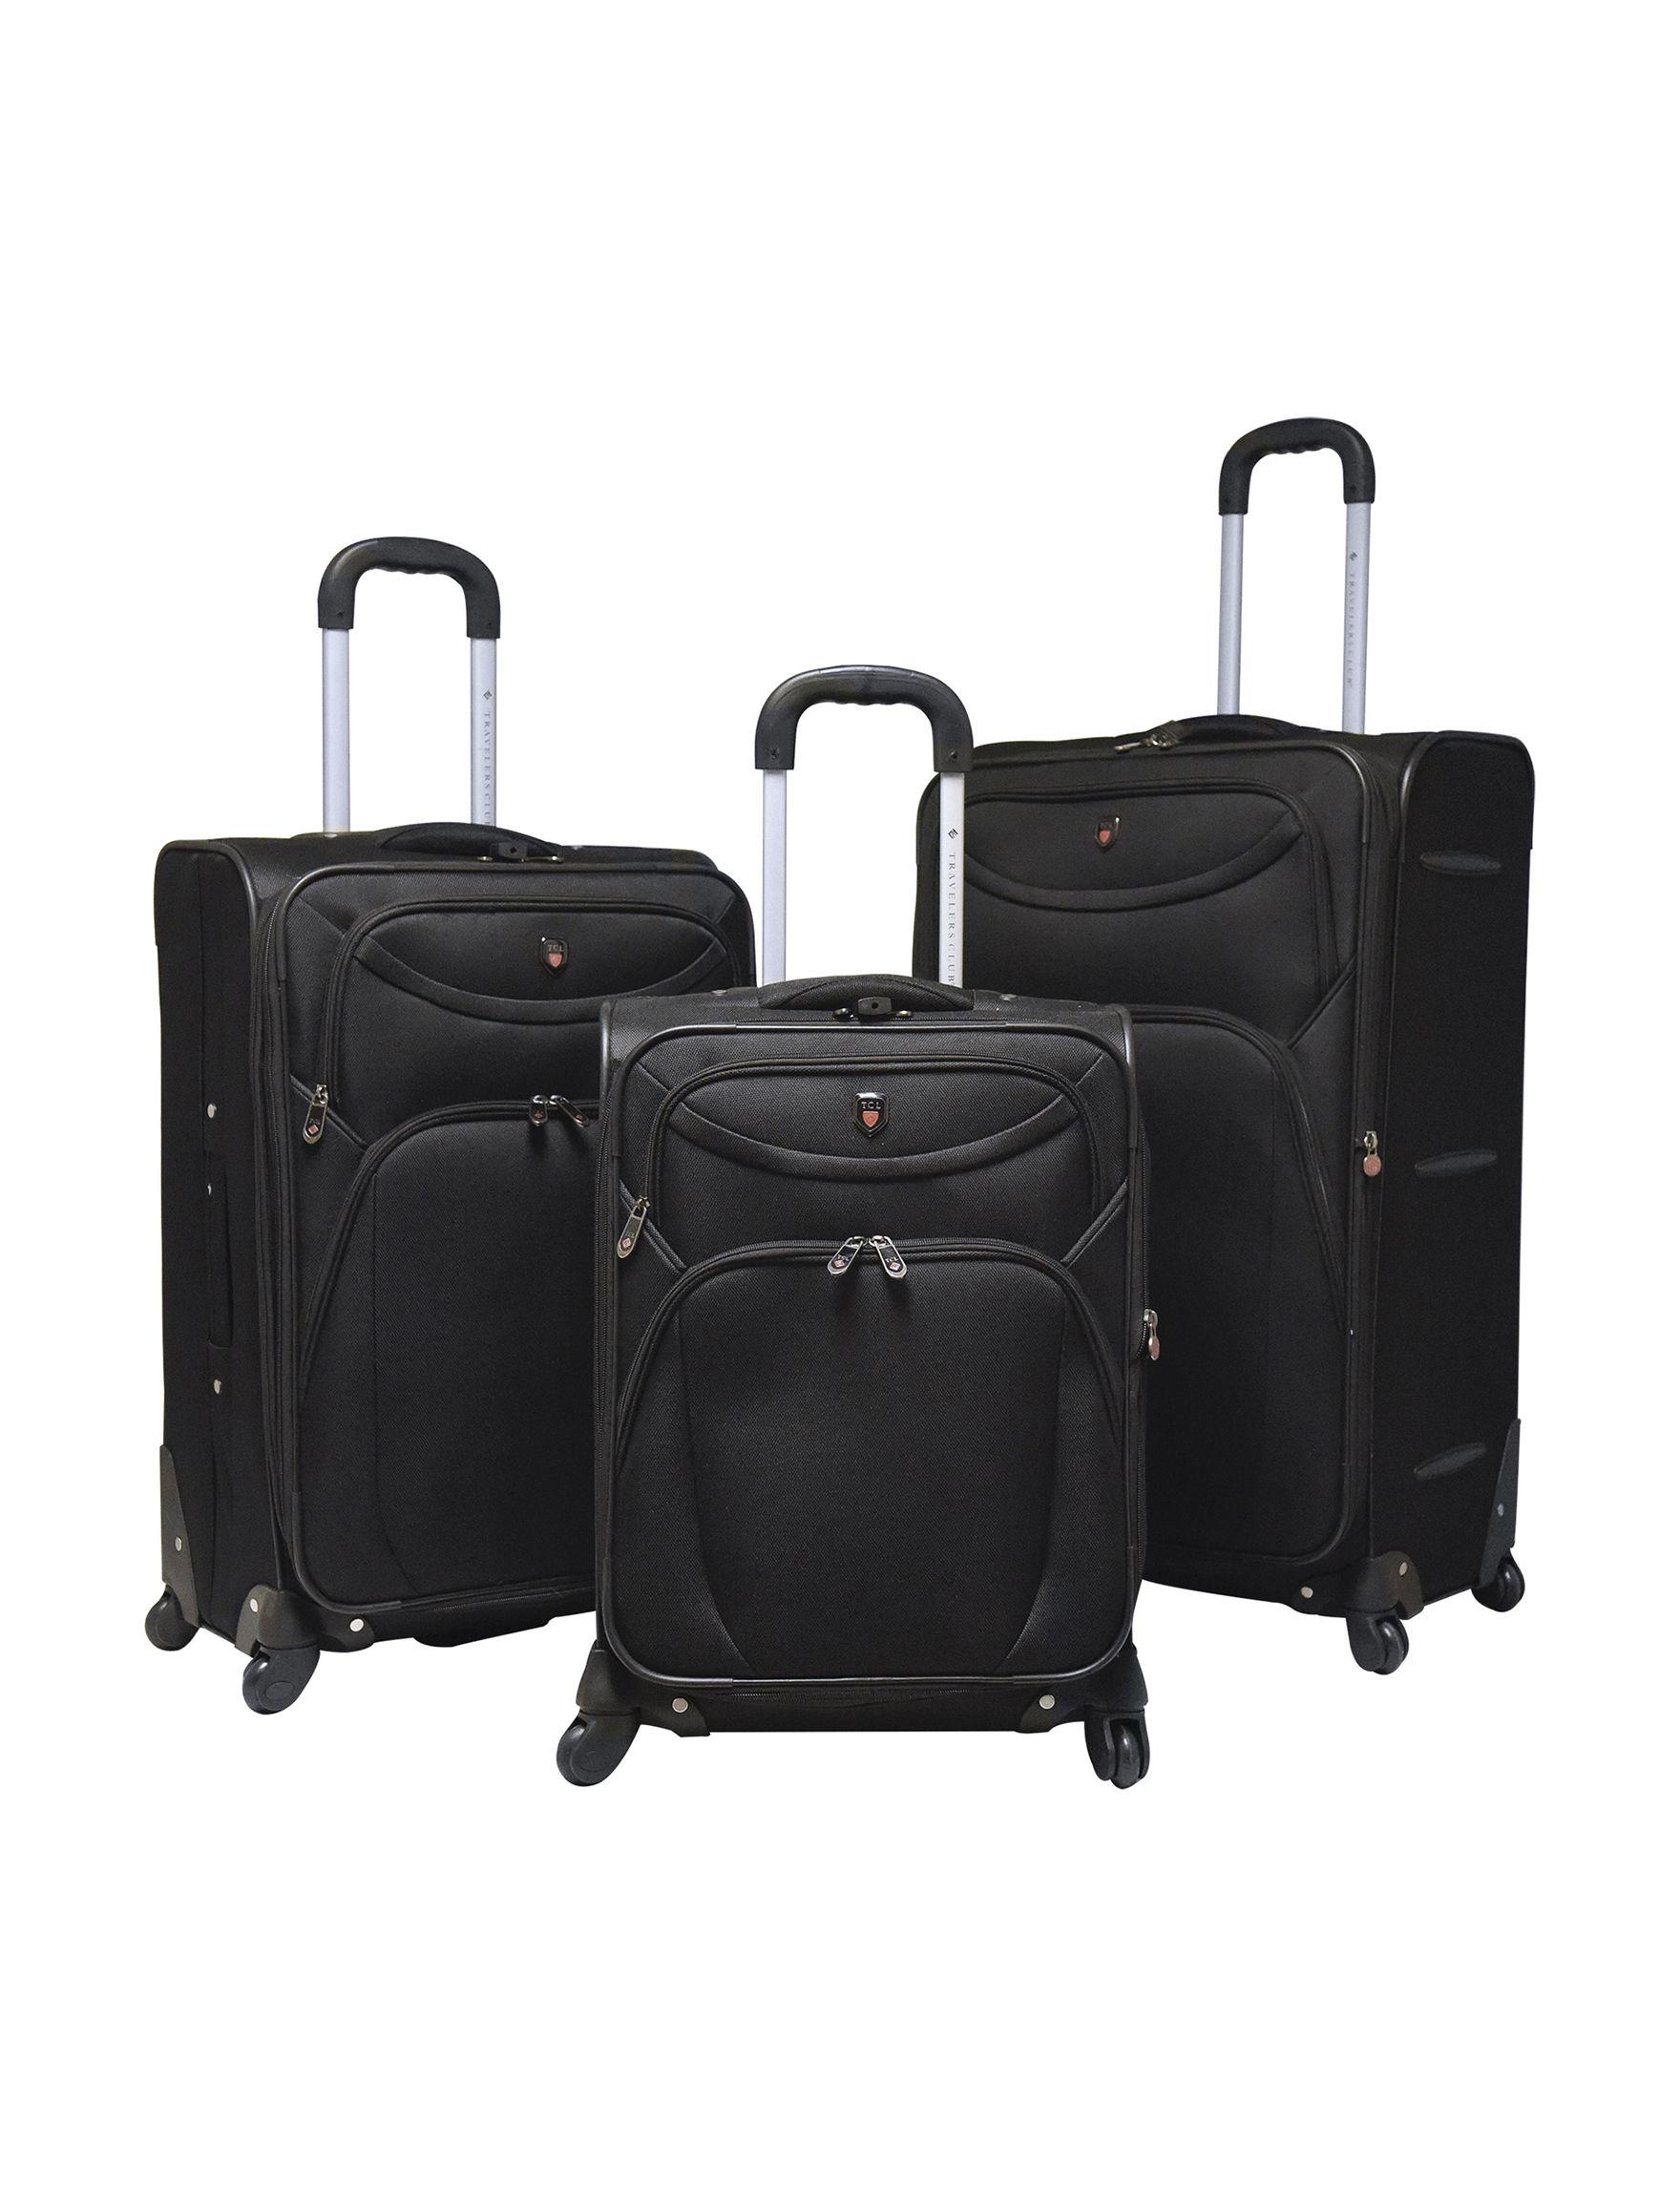 Travelers Club Luggage Black Luggage Sets